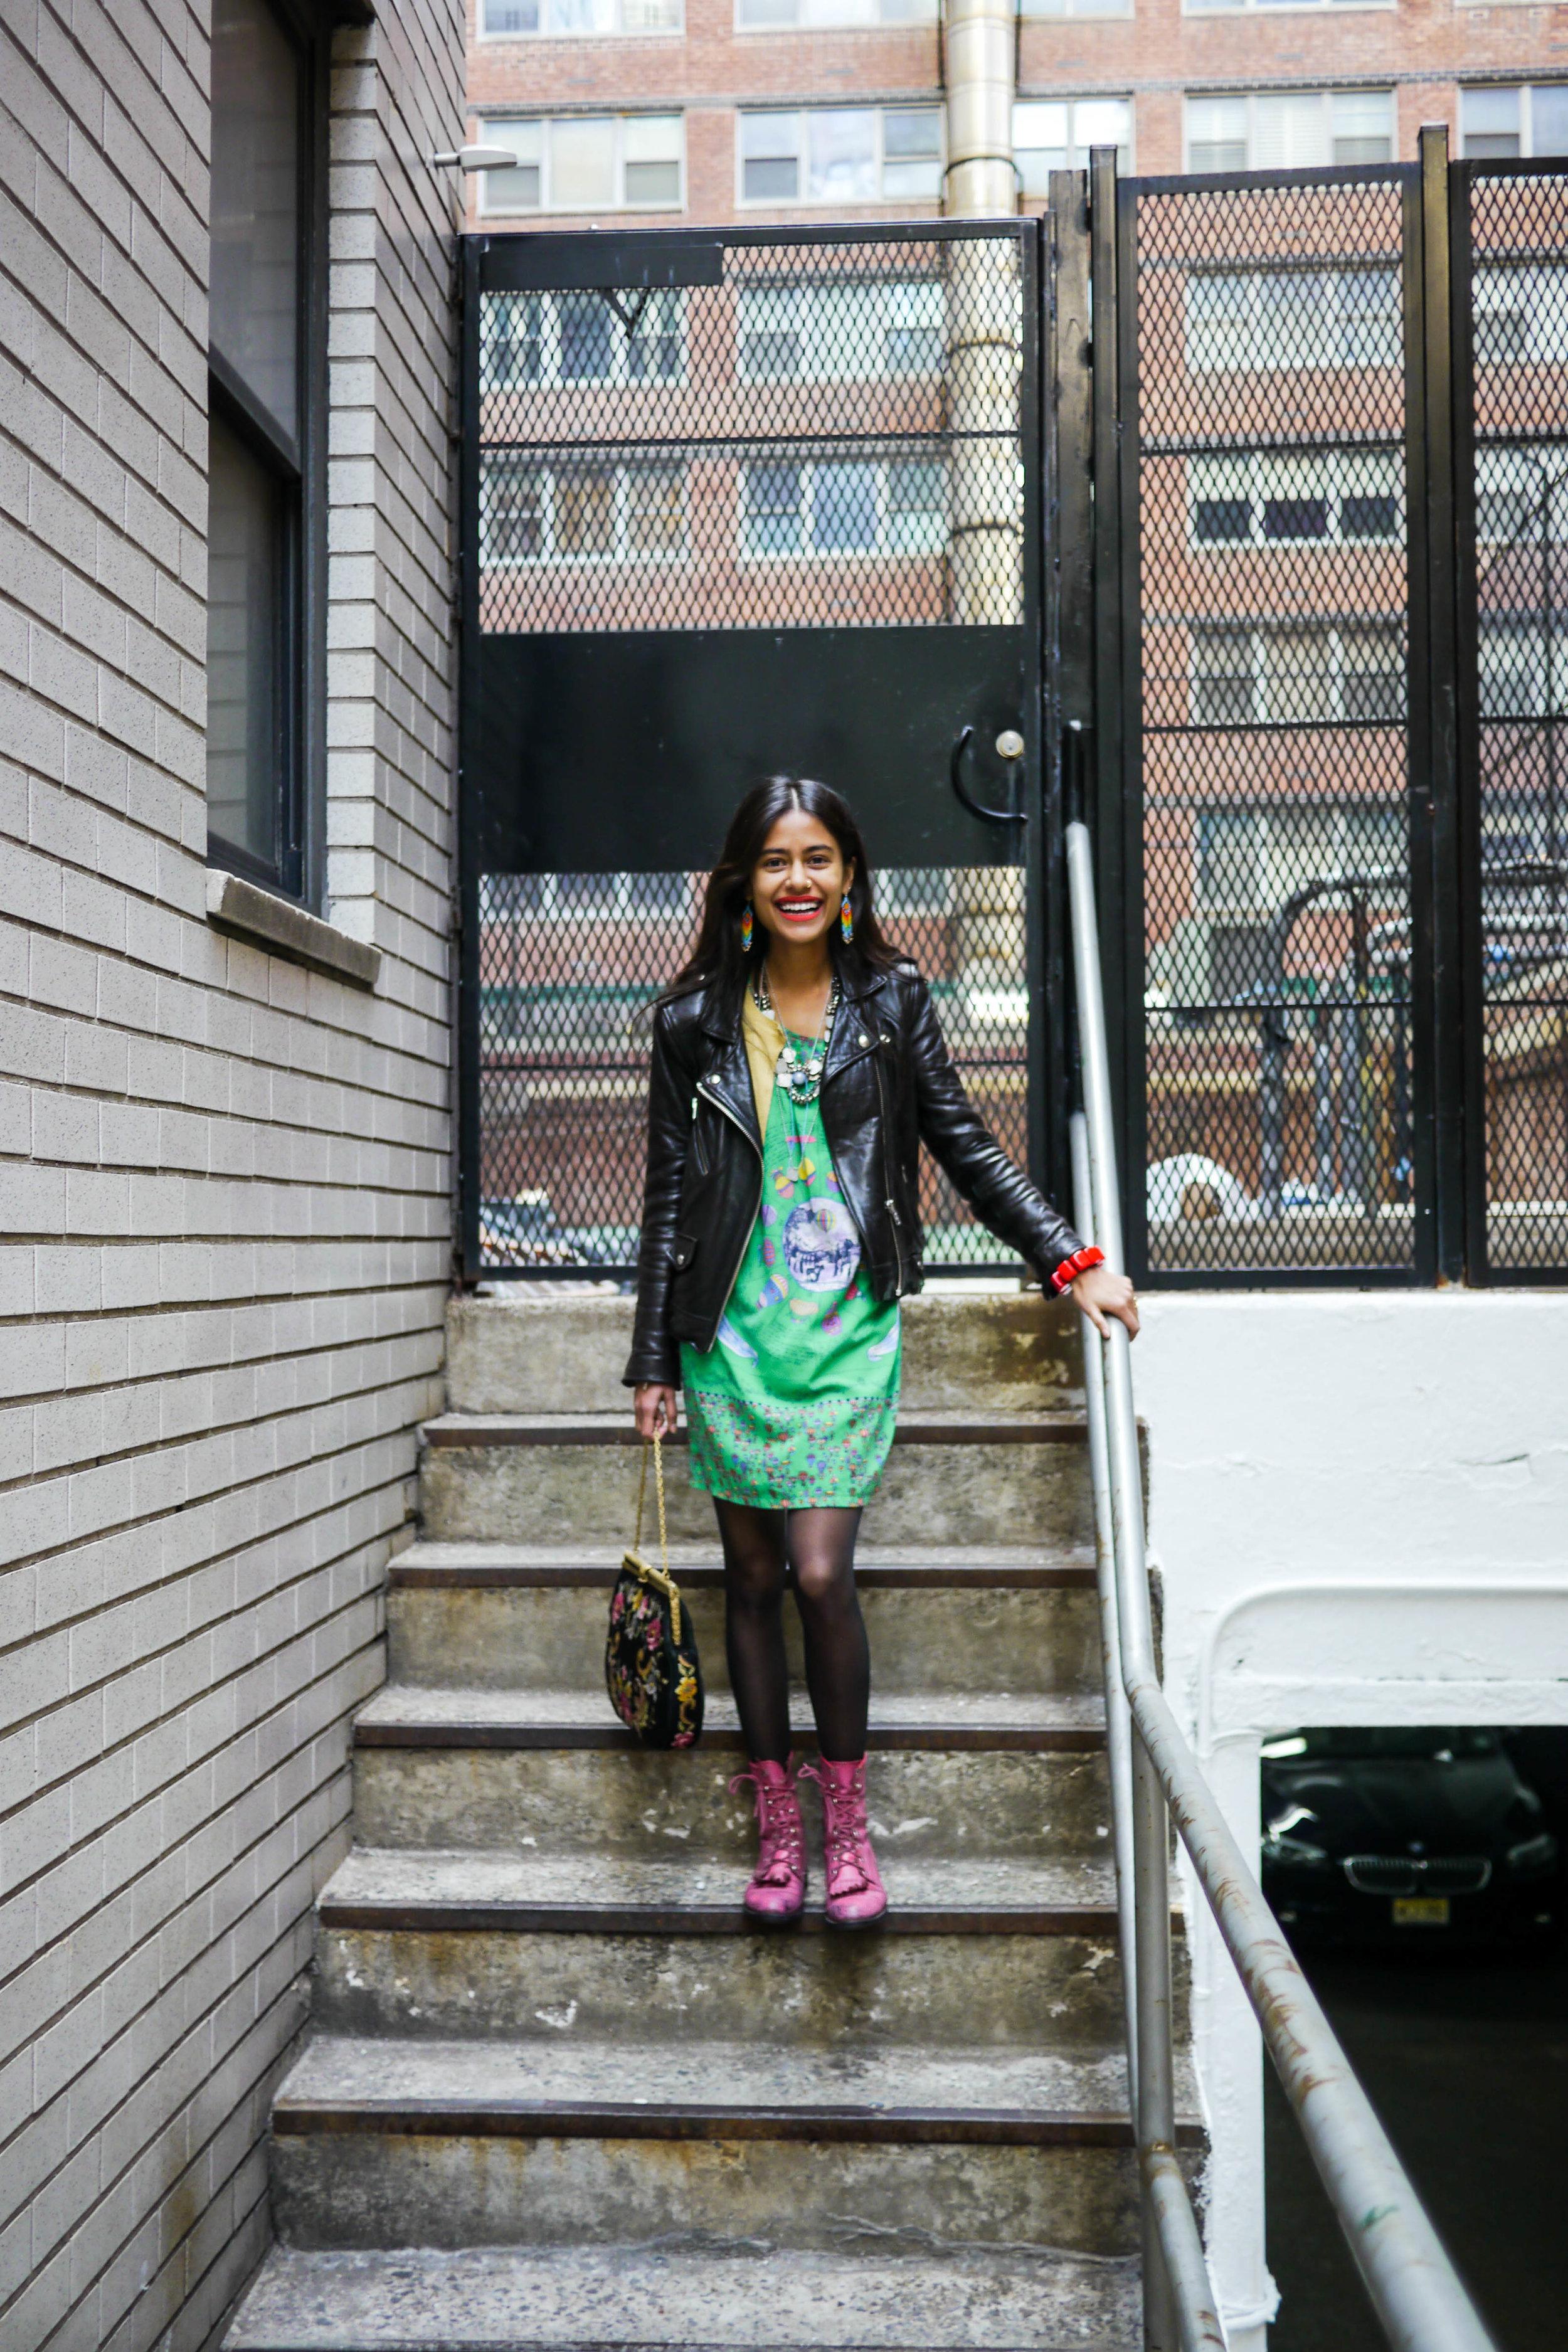 Streetstlye Details: Dress & Bag, Vintage ;    Jacket, IRO    ; Shoes, Saint Laurent ;    Earrings & Necklace, Arpana Rayamjhi